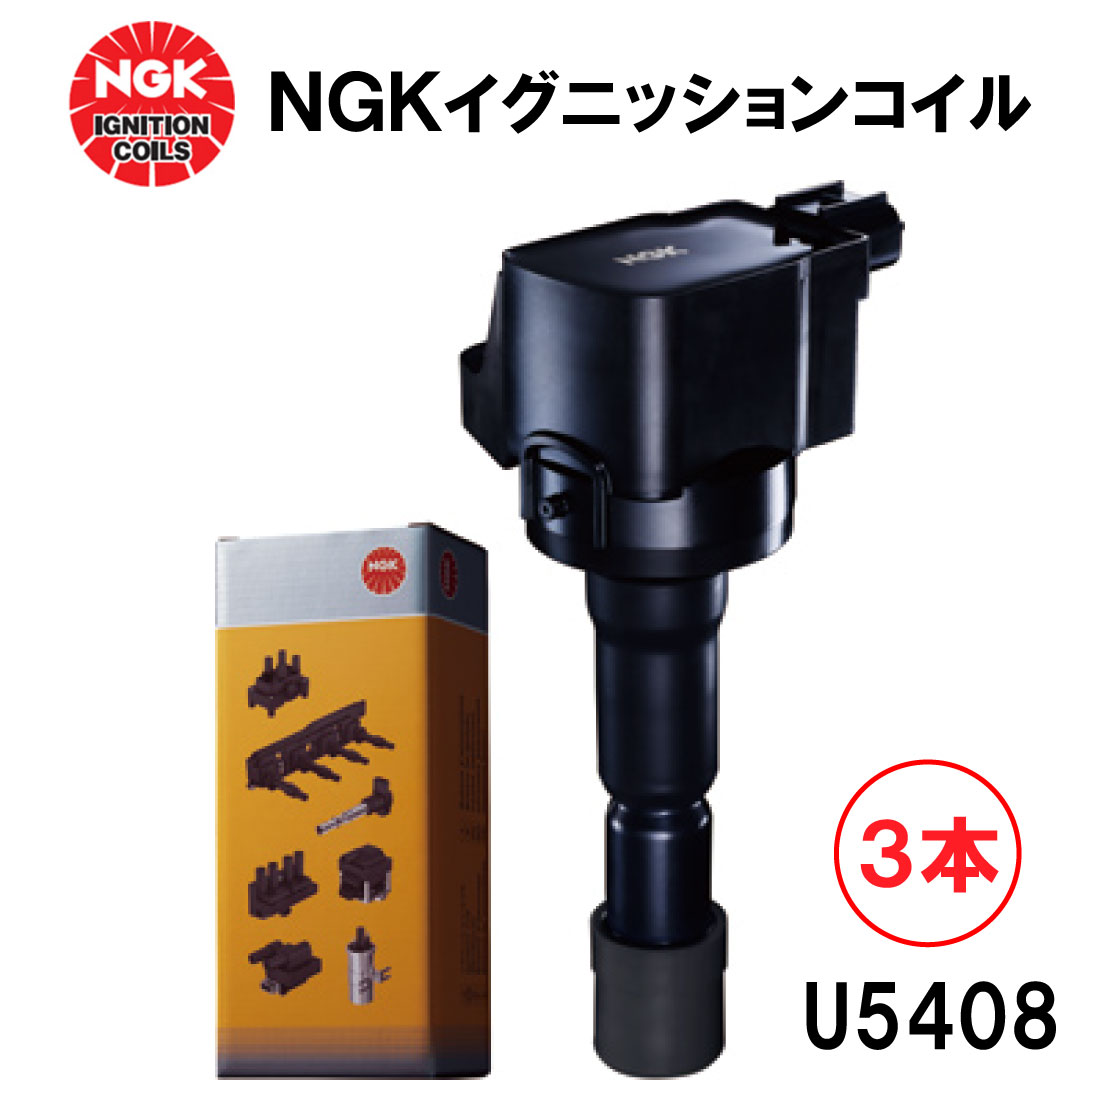 NGK イグニッションコイル U5408 3本セット 49191 純正部品番号 30520-5Z1-013 ホンダ N-BOX N-BOX+ N-BOXスラッシュ N-ONE N-WGN